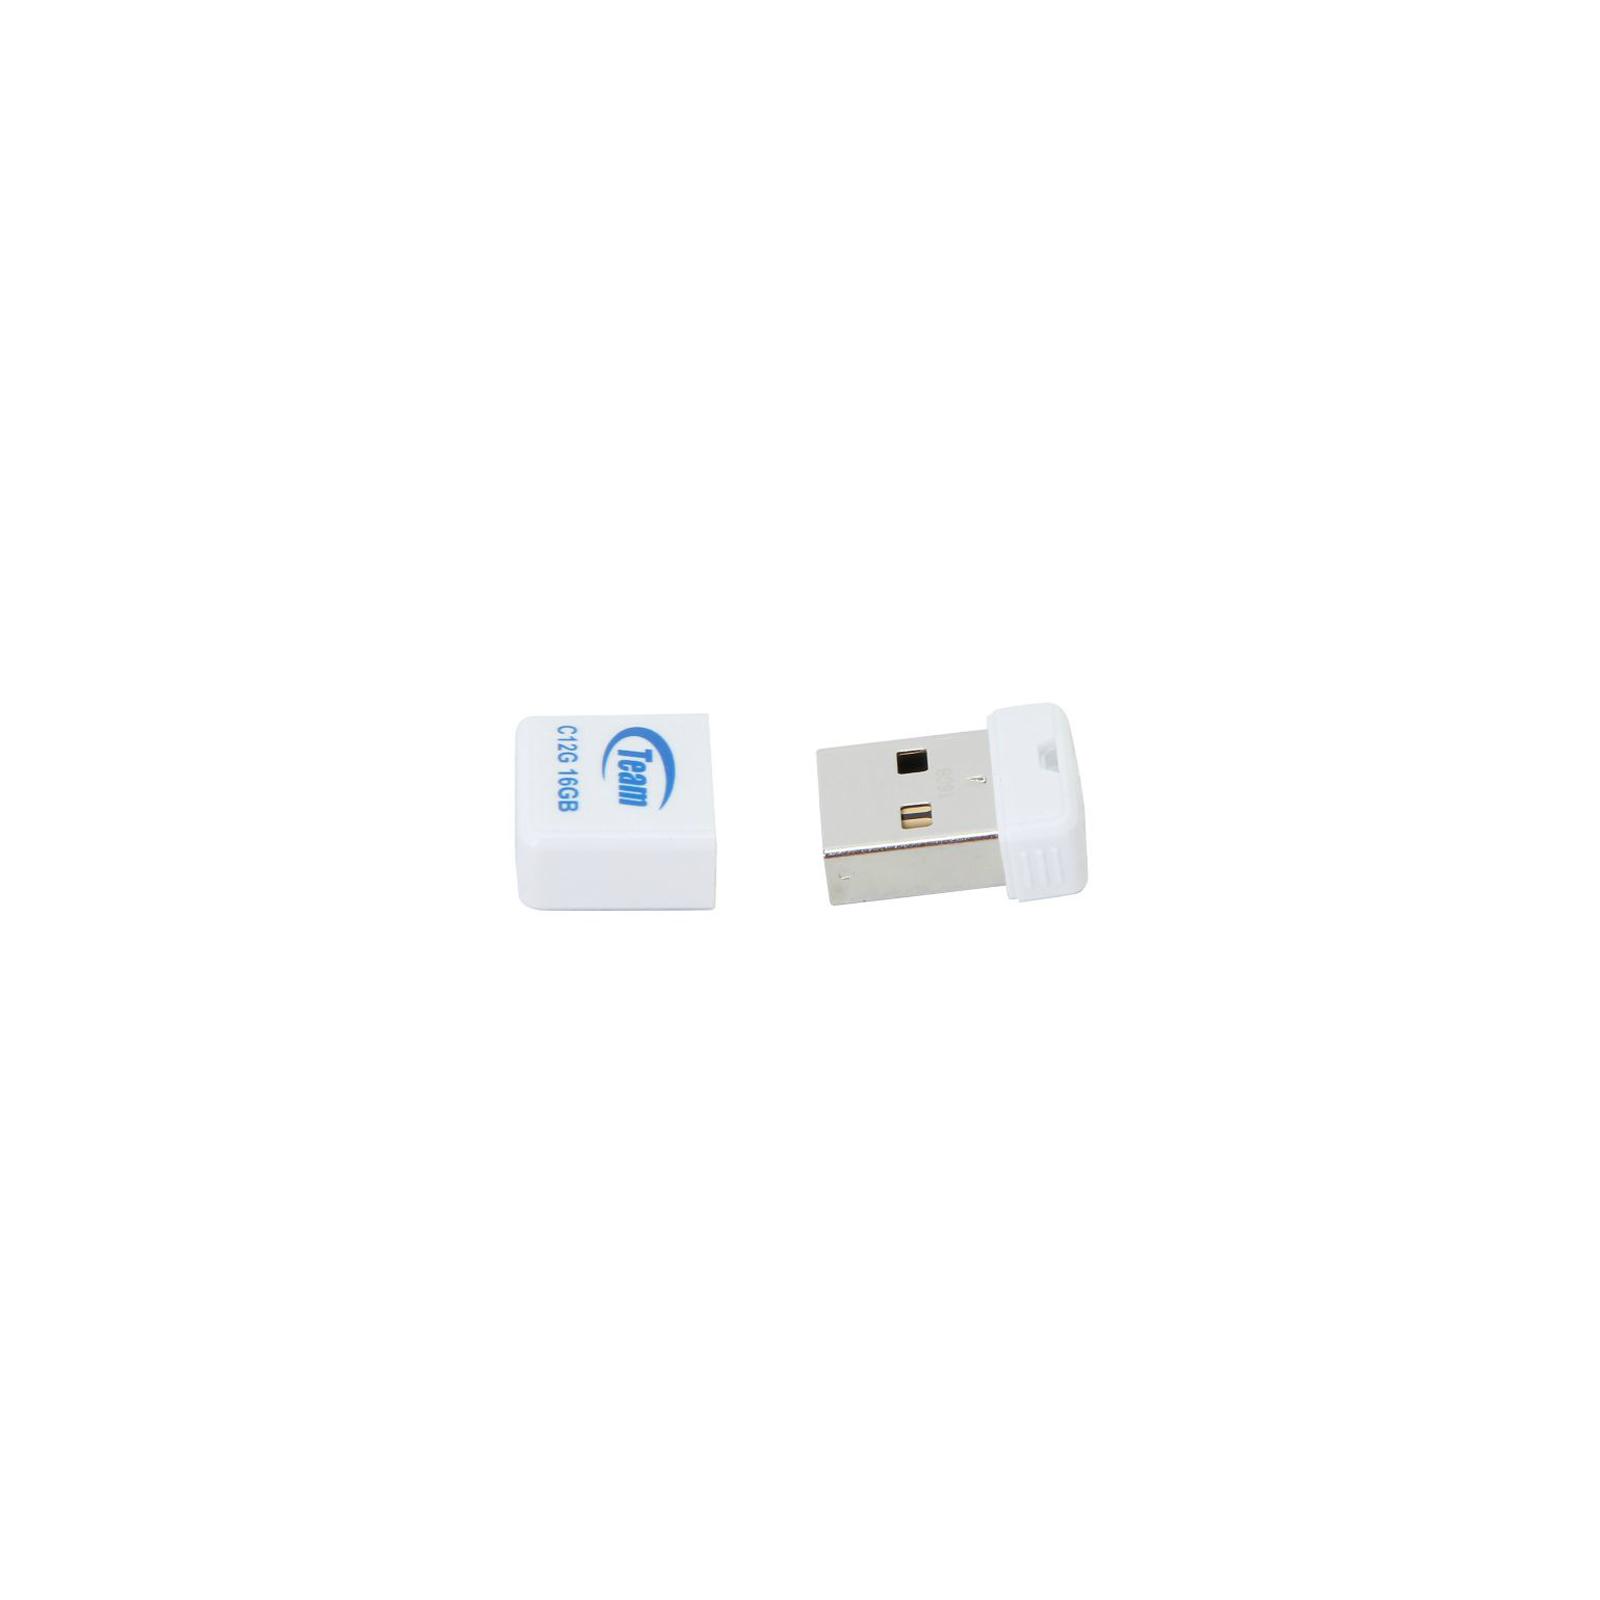 USB флеш накопитель Team 32GB C12G White USB 2.0 (TC12G32GW01) изображение 3